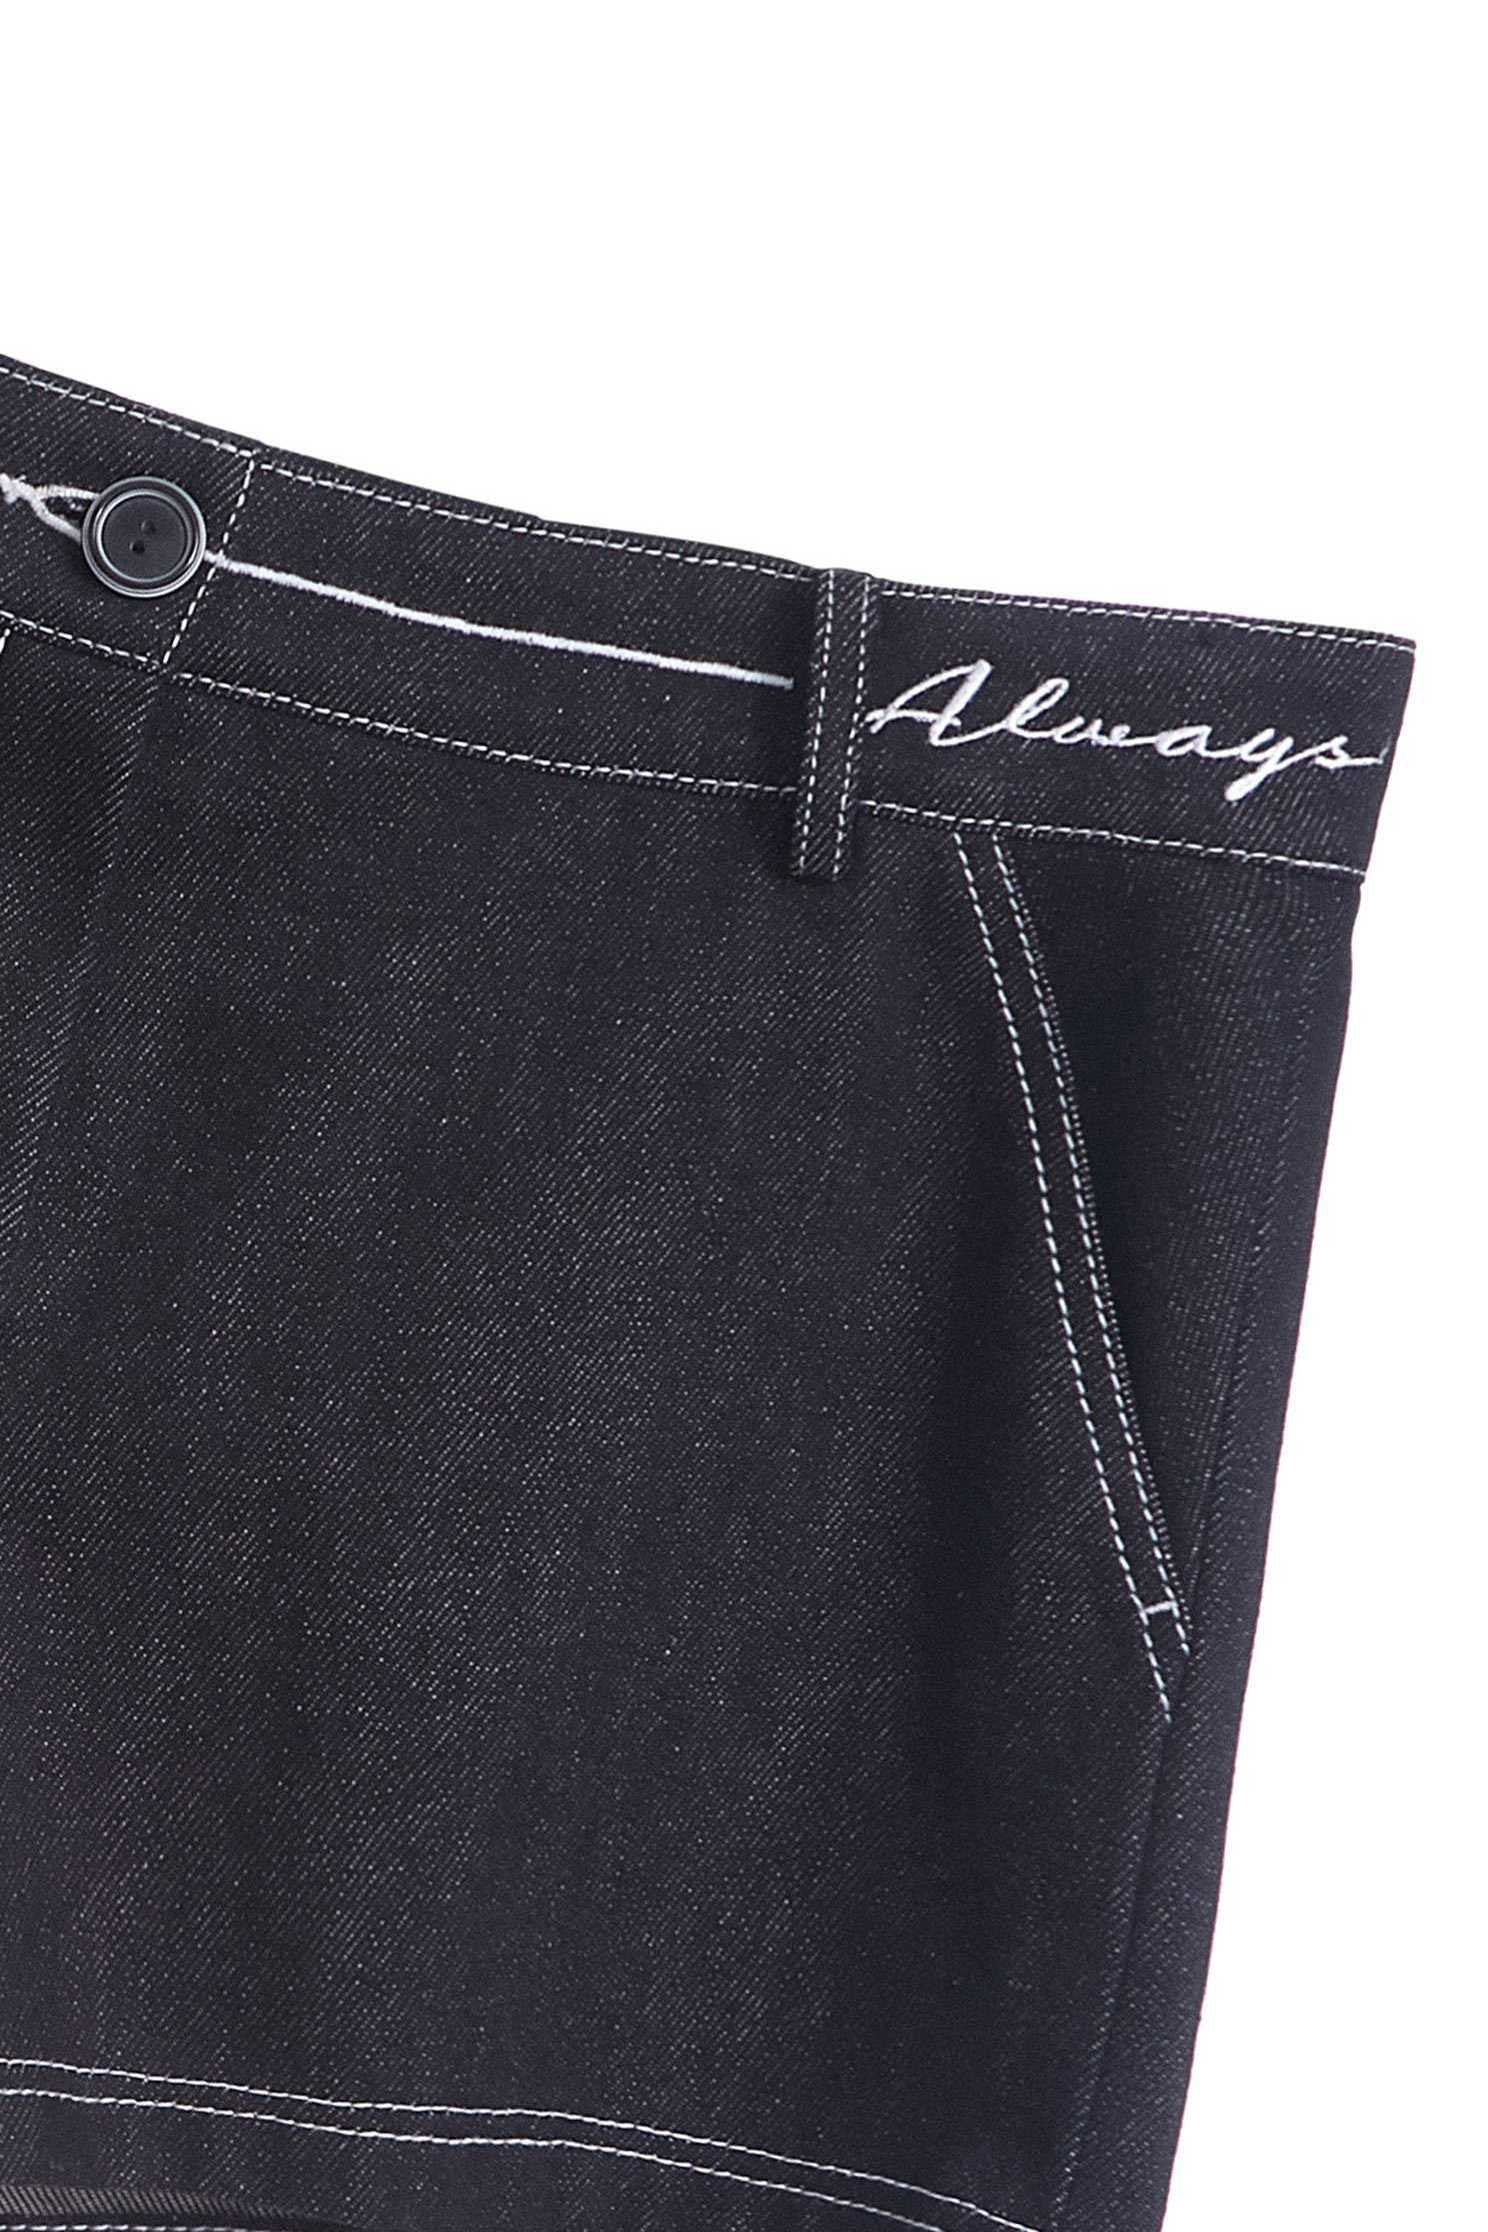 Neat white ditch denim short,Tanning,cowboy,Women's denim shorts,Jeans,Shorts,embroidered,Black jeans,黑色褲子